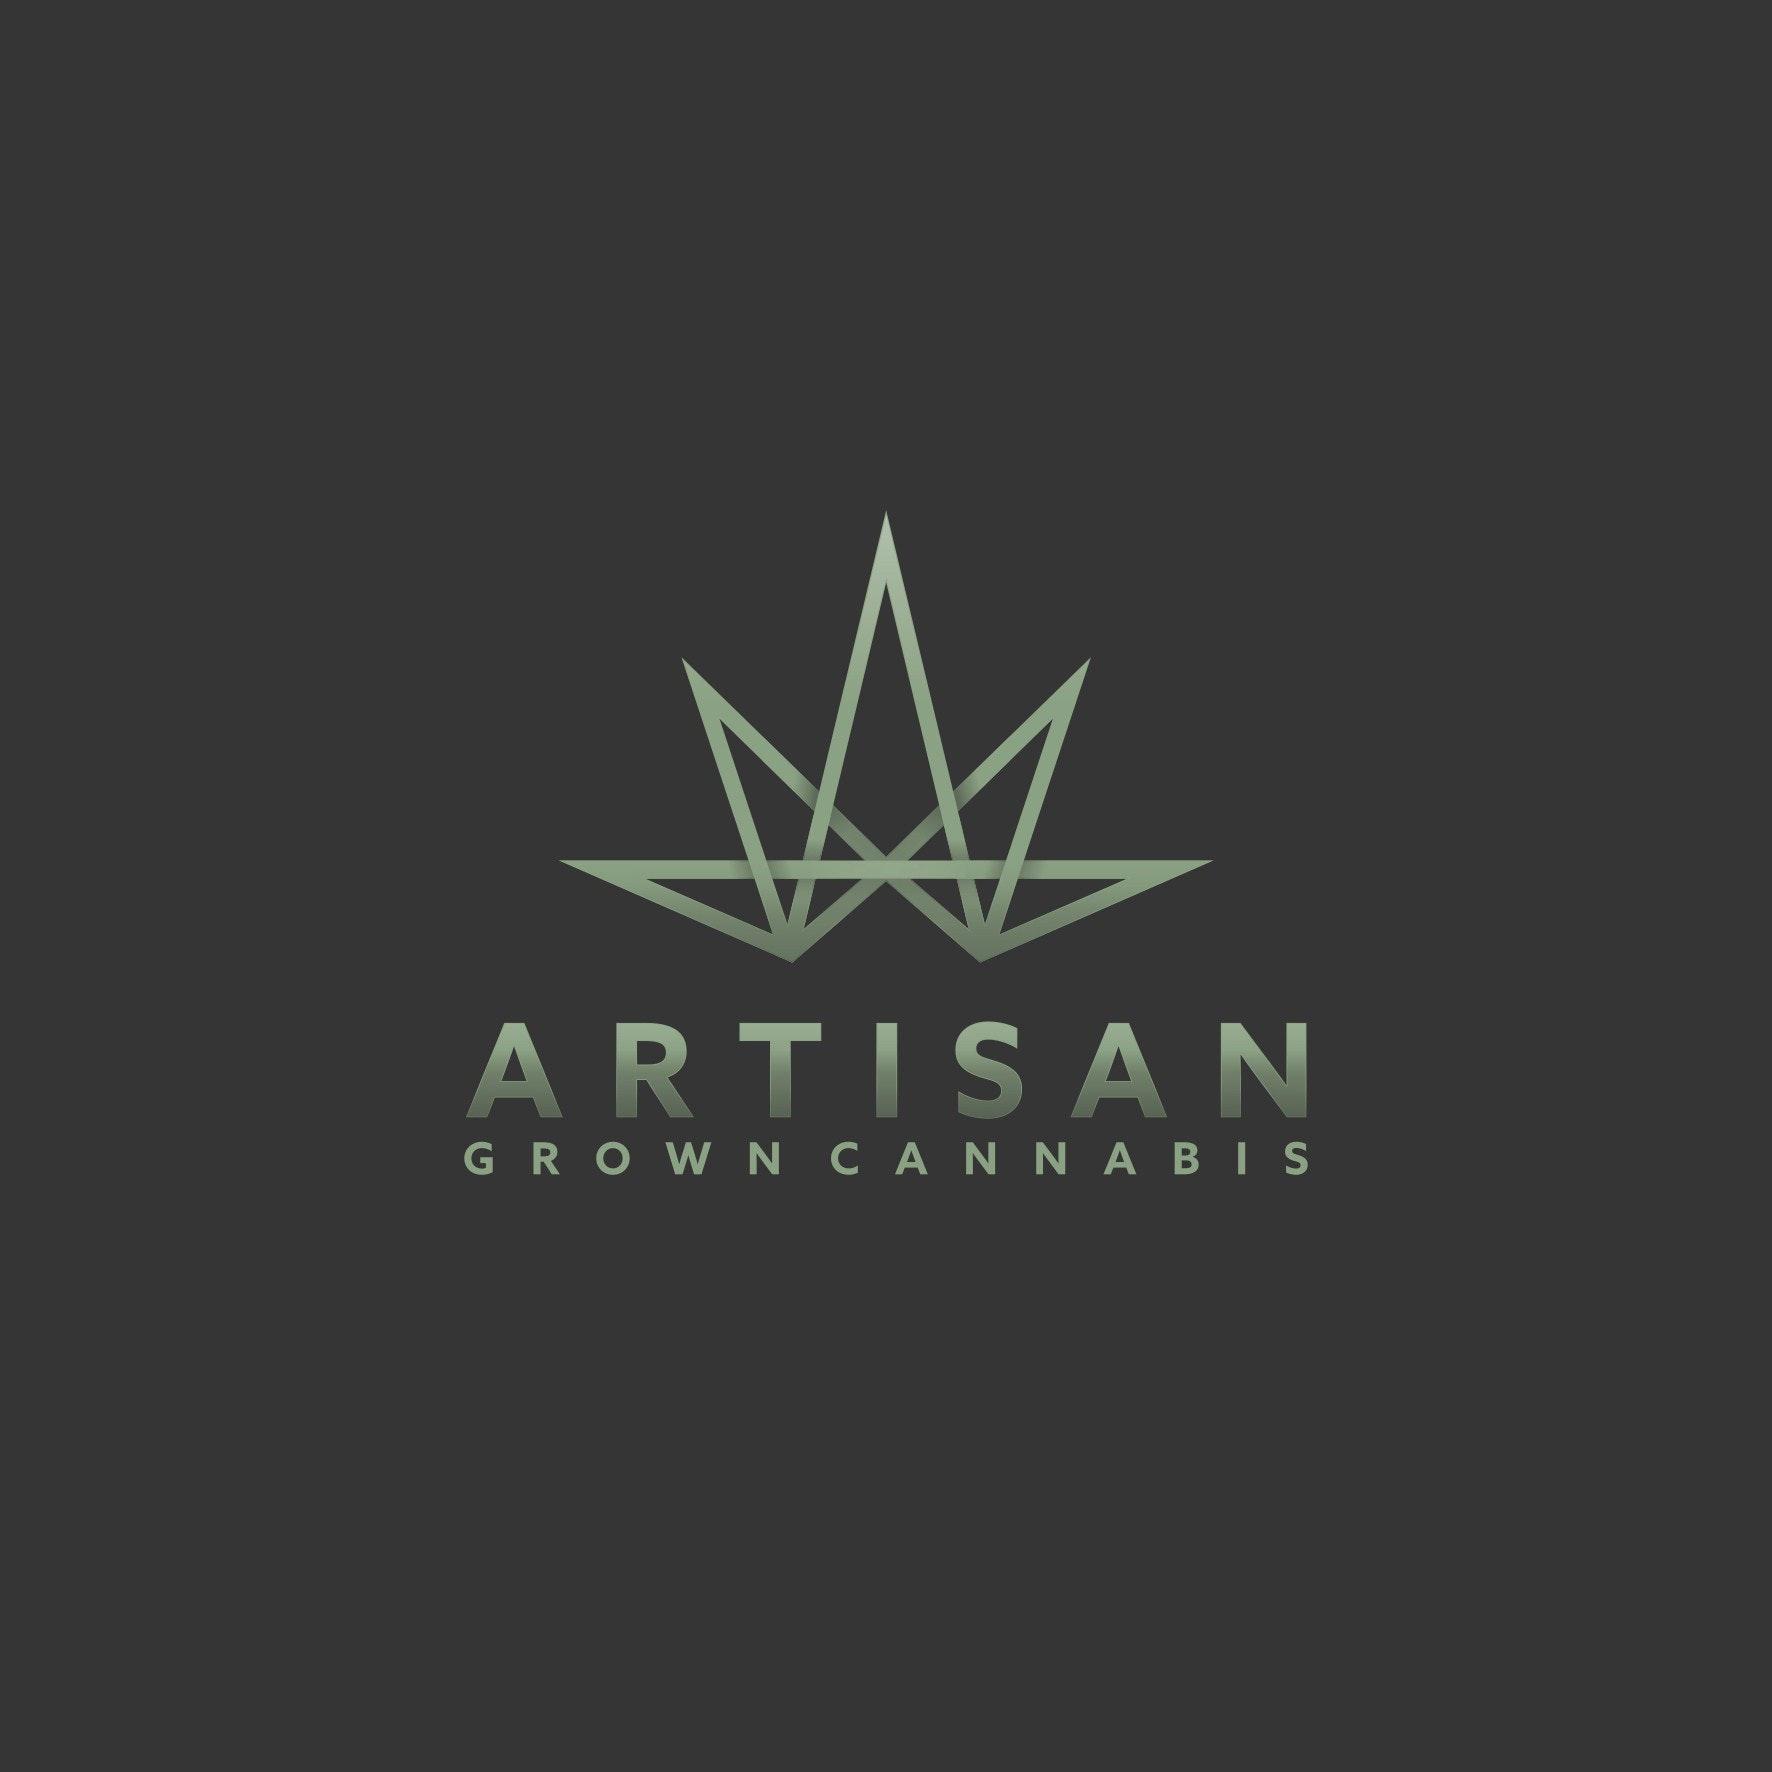 Modern cannabis logo design for Artisan